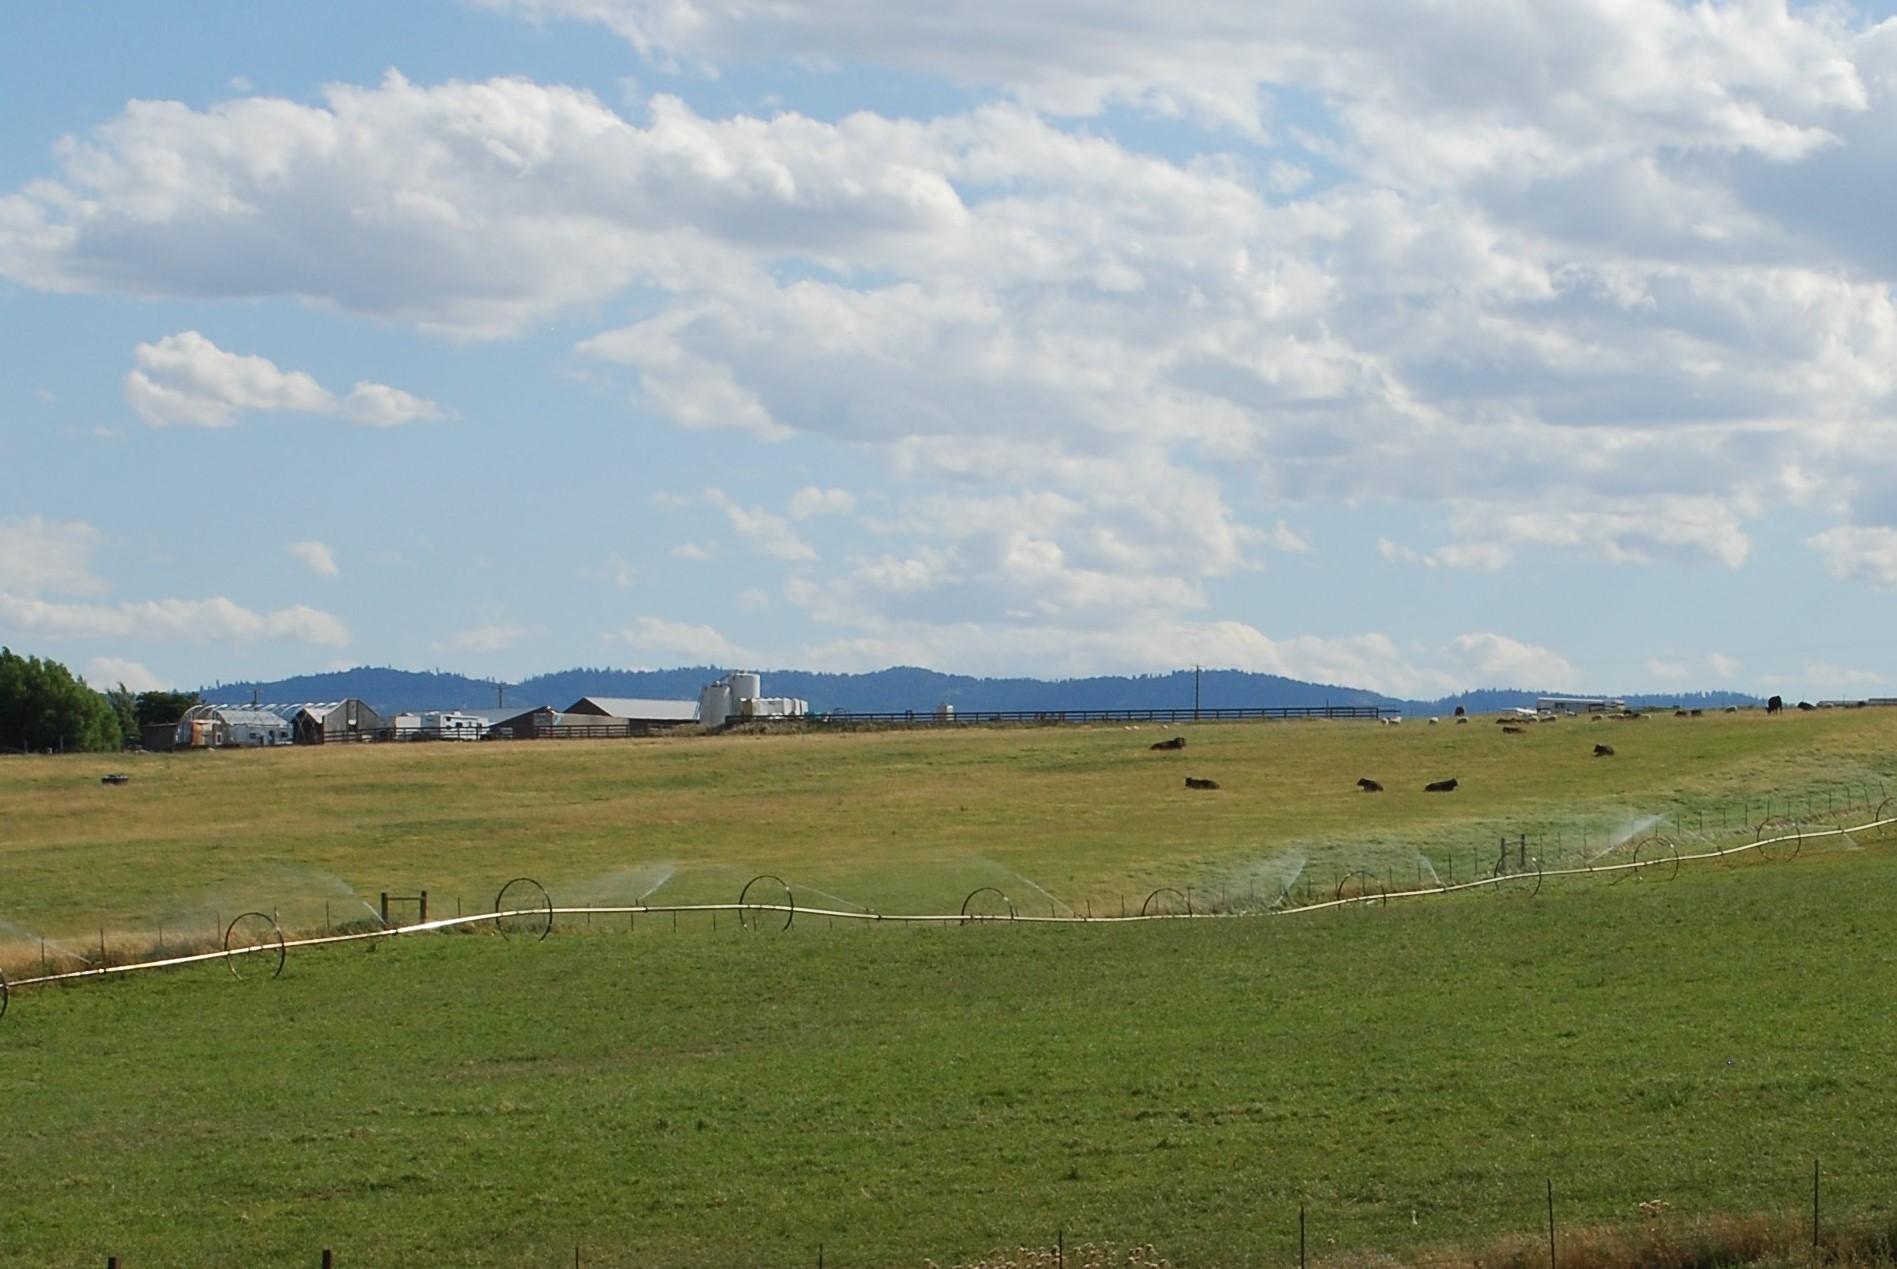 Windy N Ranch